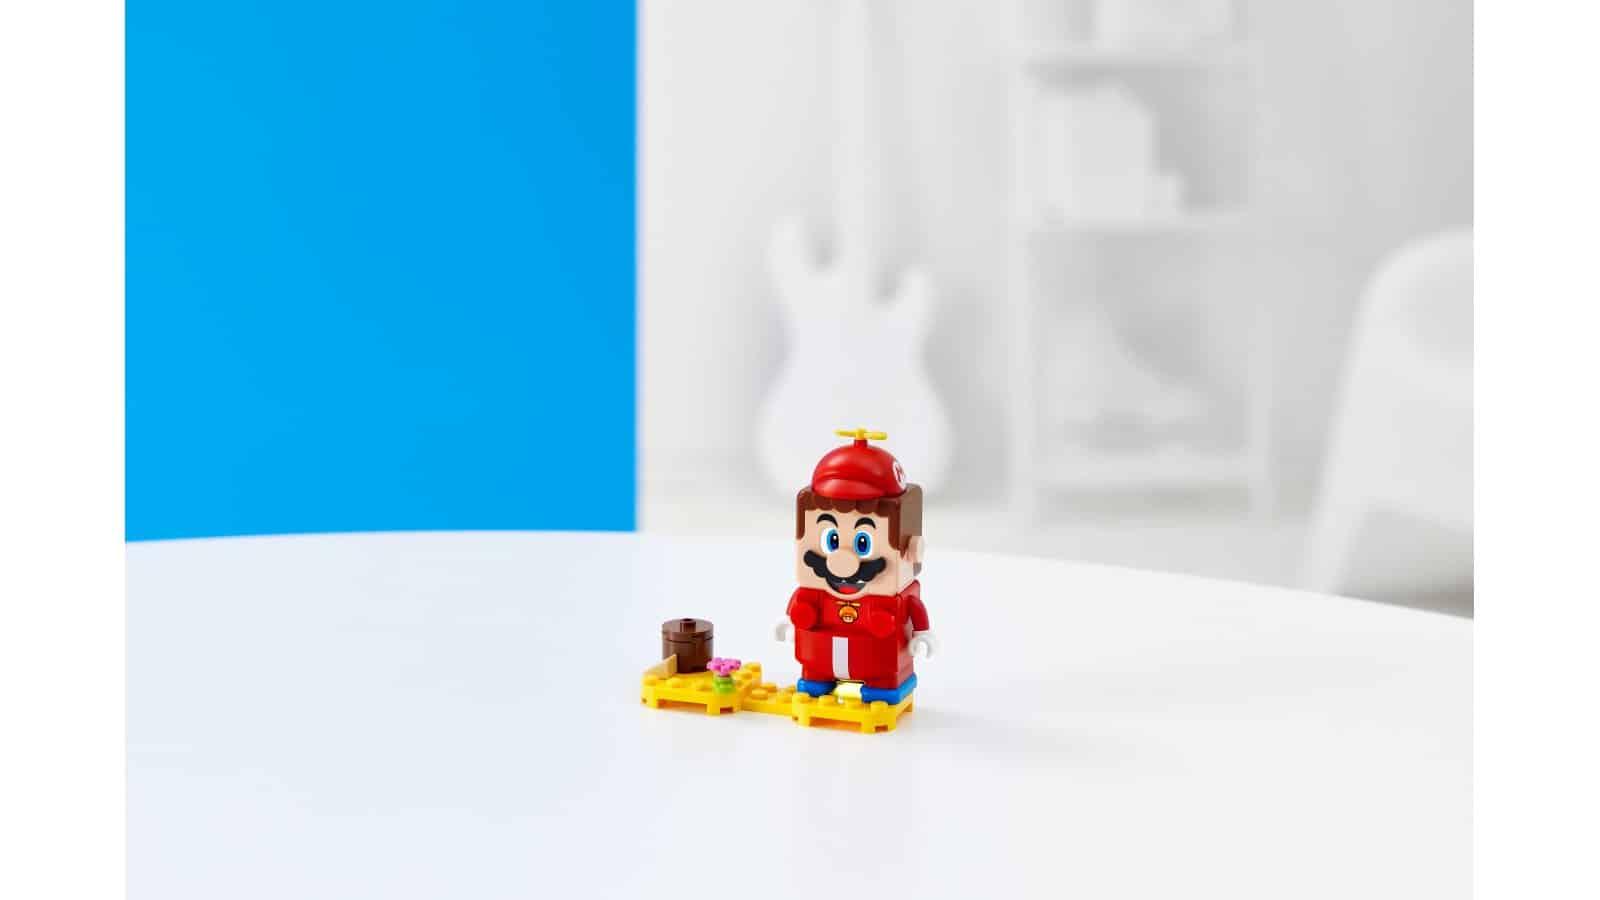 LEGO 71371 Propeller Mario Power-Up Pack - מריו עם השדרוג